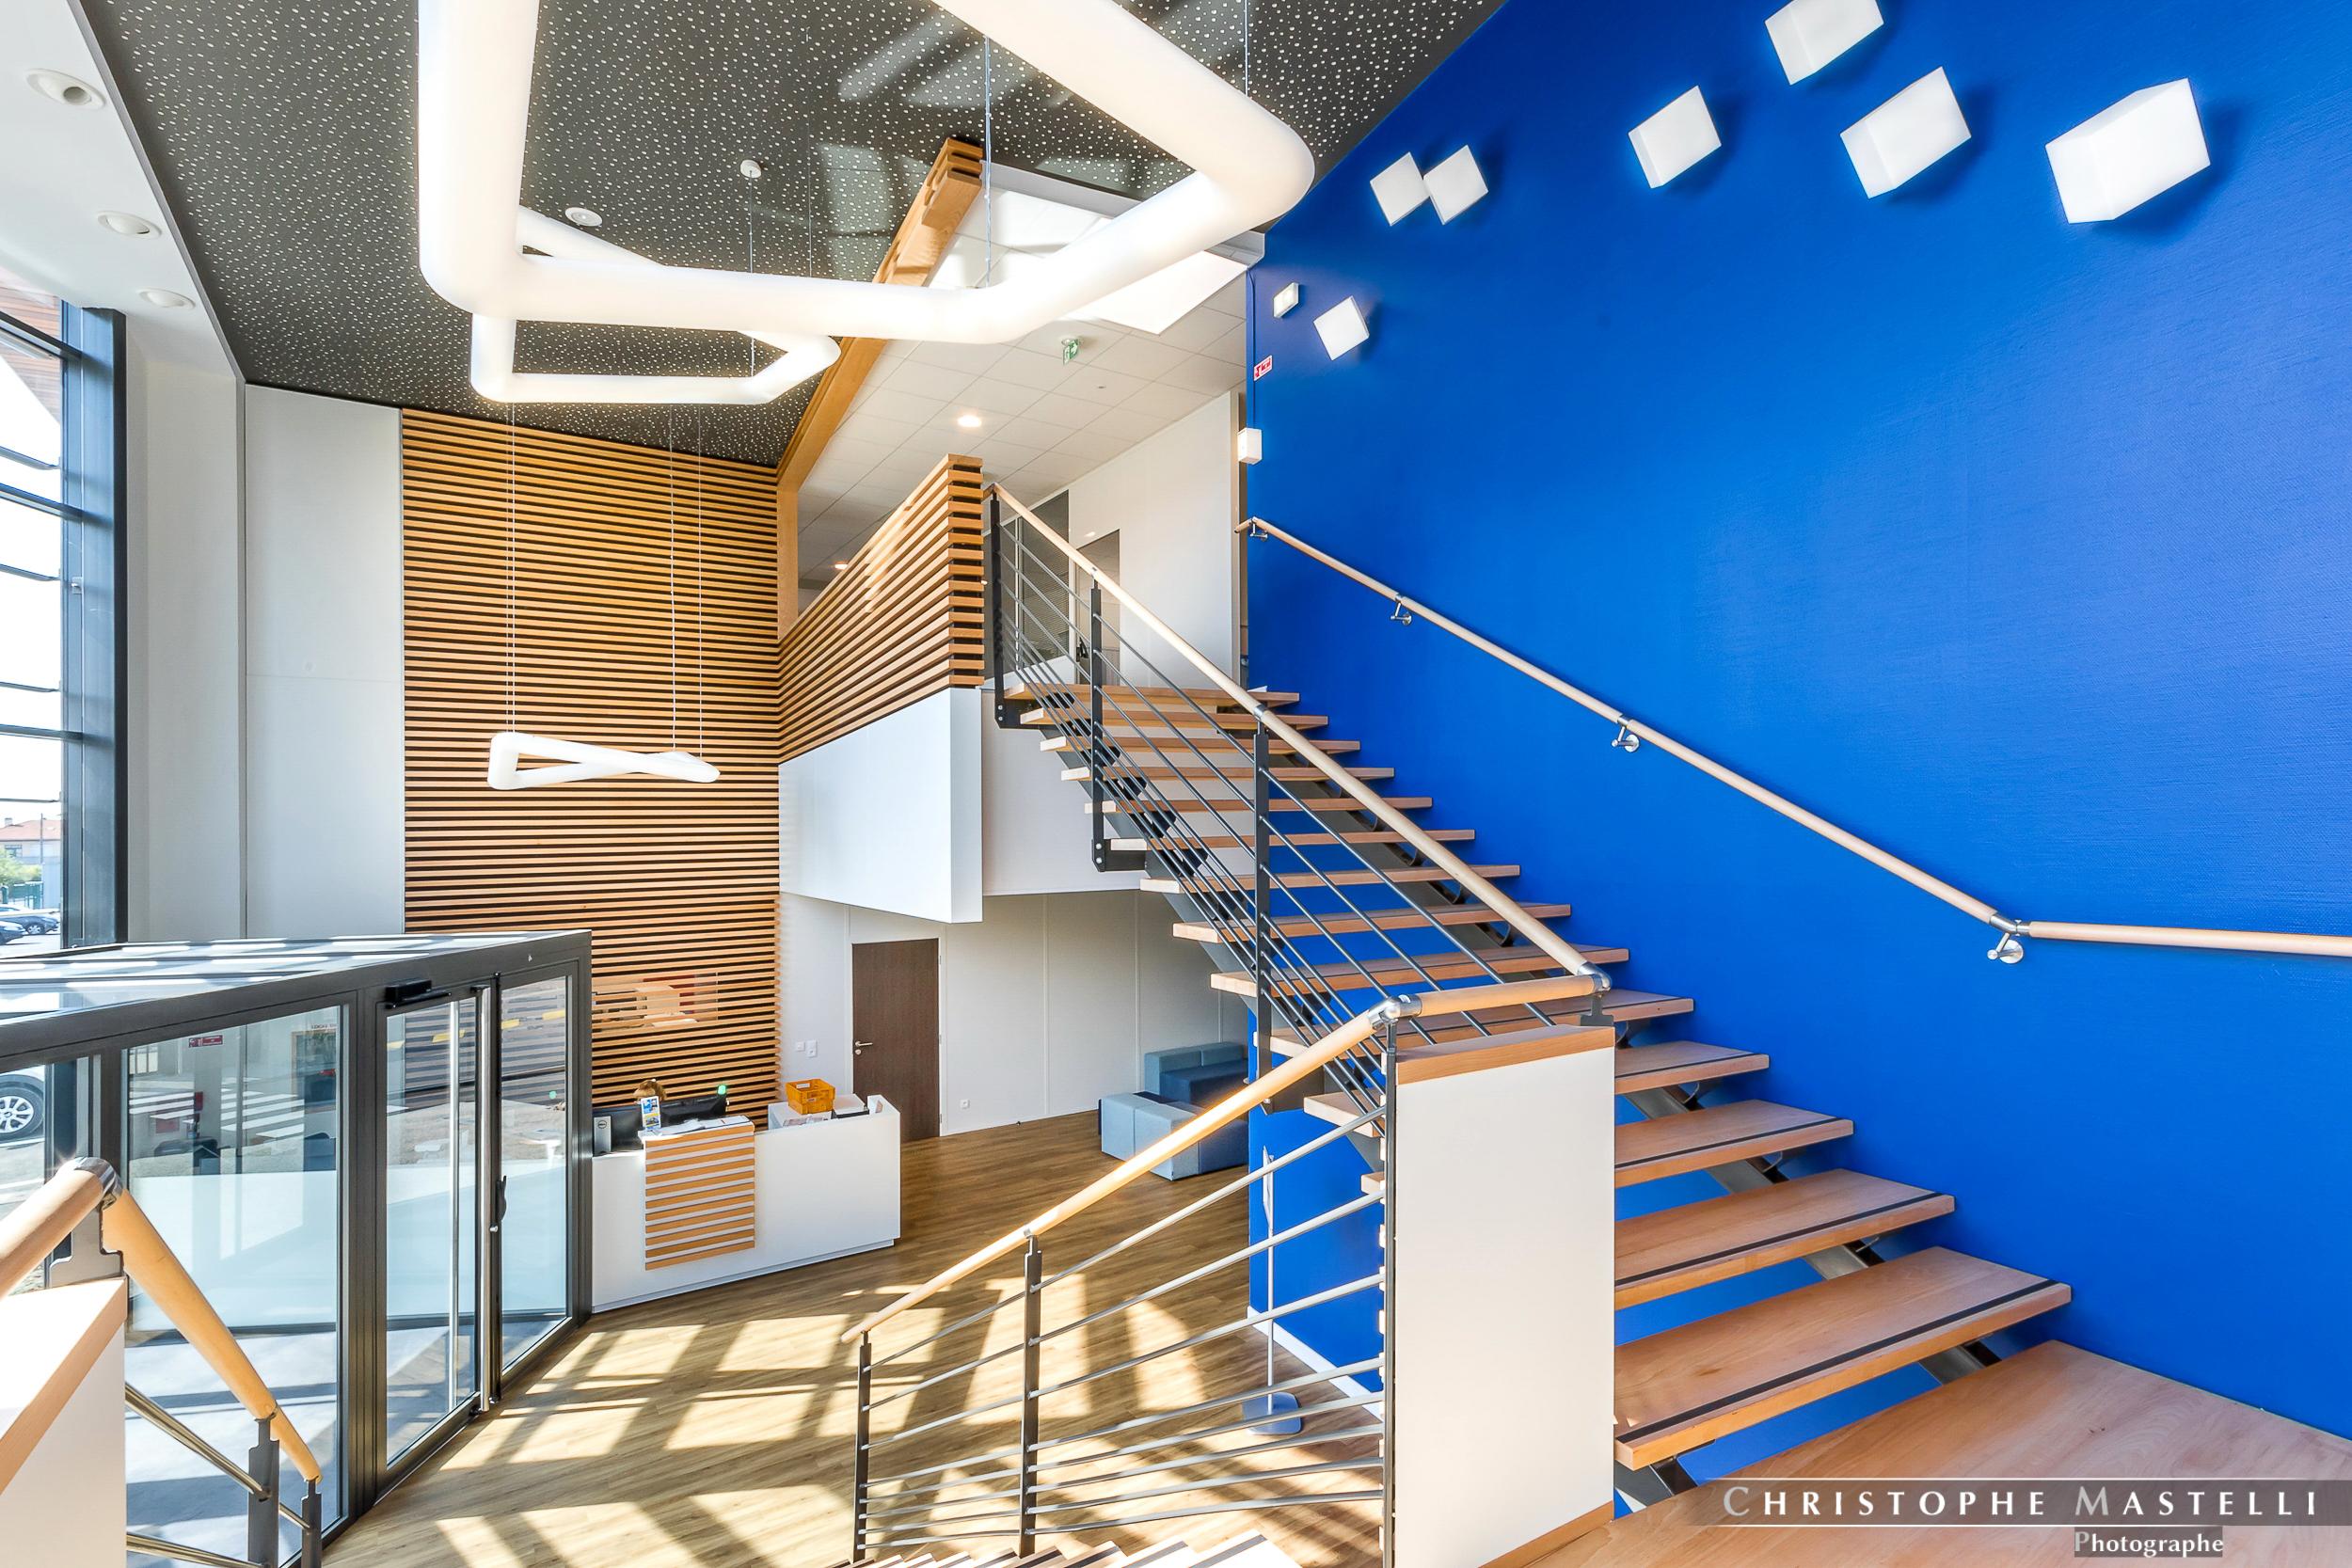 christophe mastelli photographe architecture paca